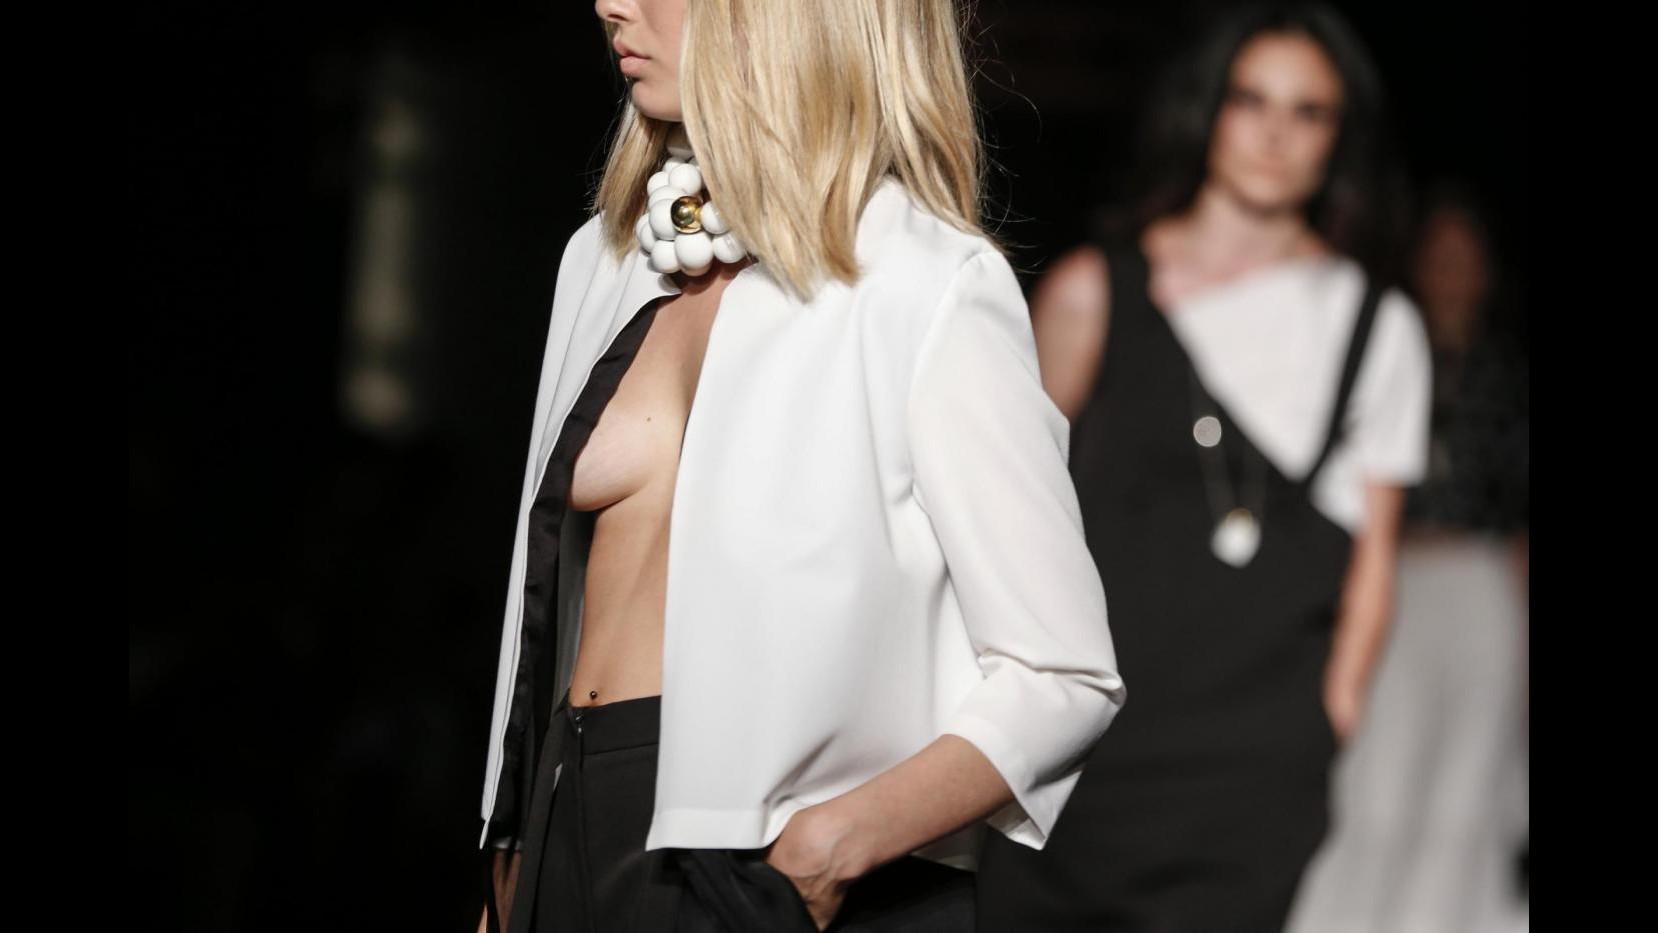 FOTO Per la prima volta Torino ospita la Fashion Week